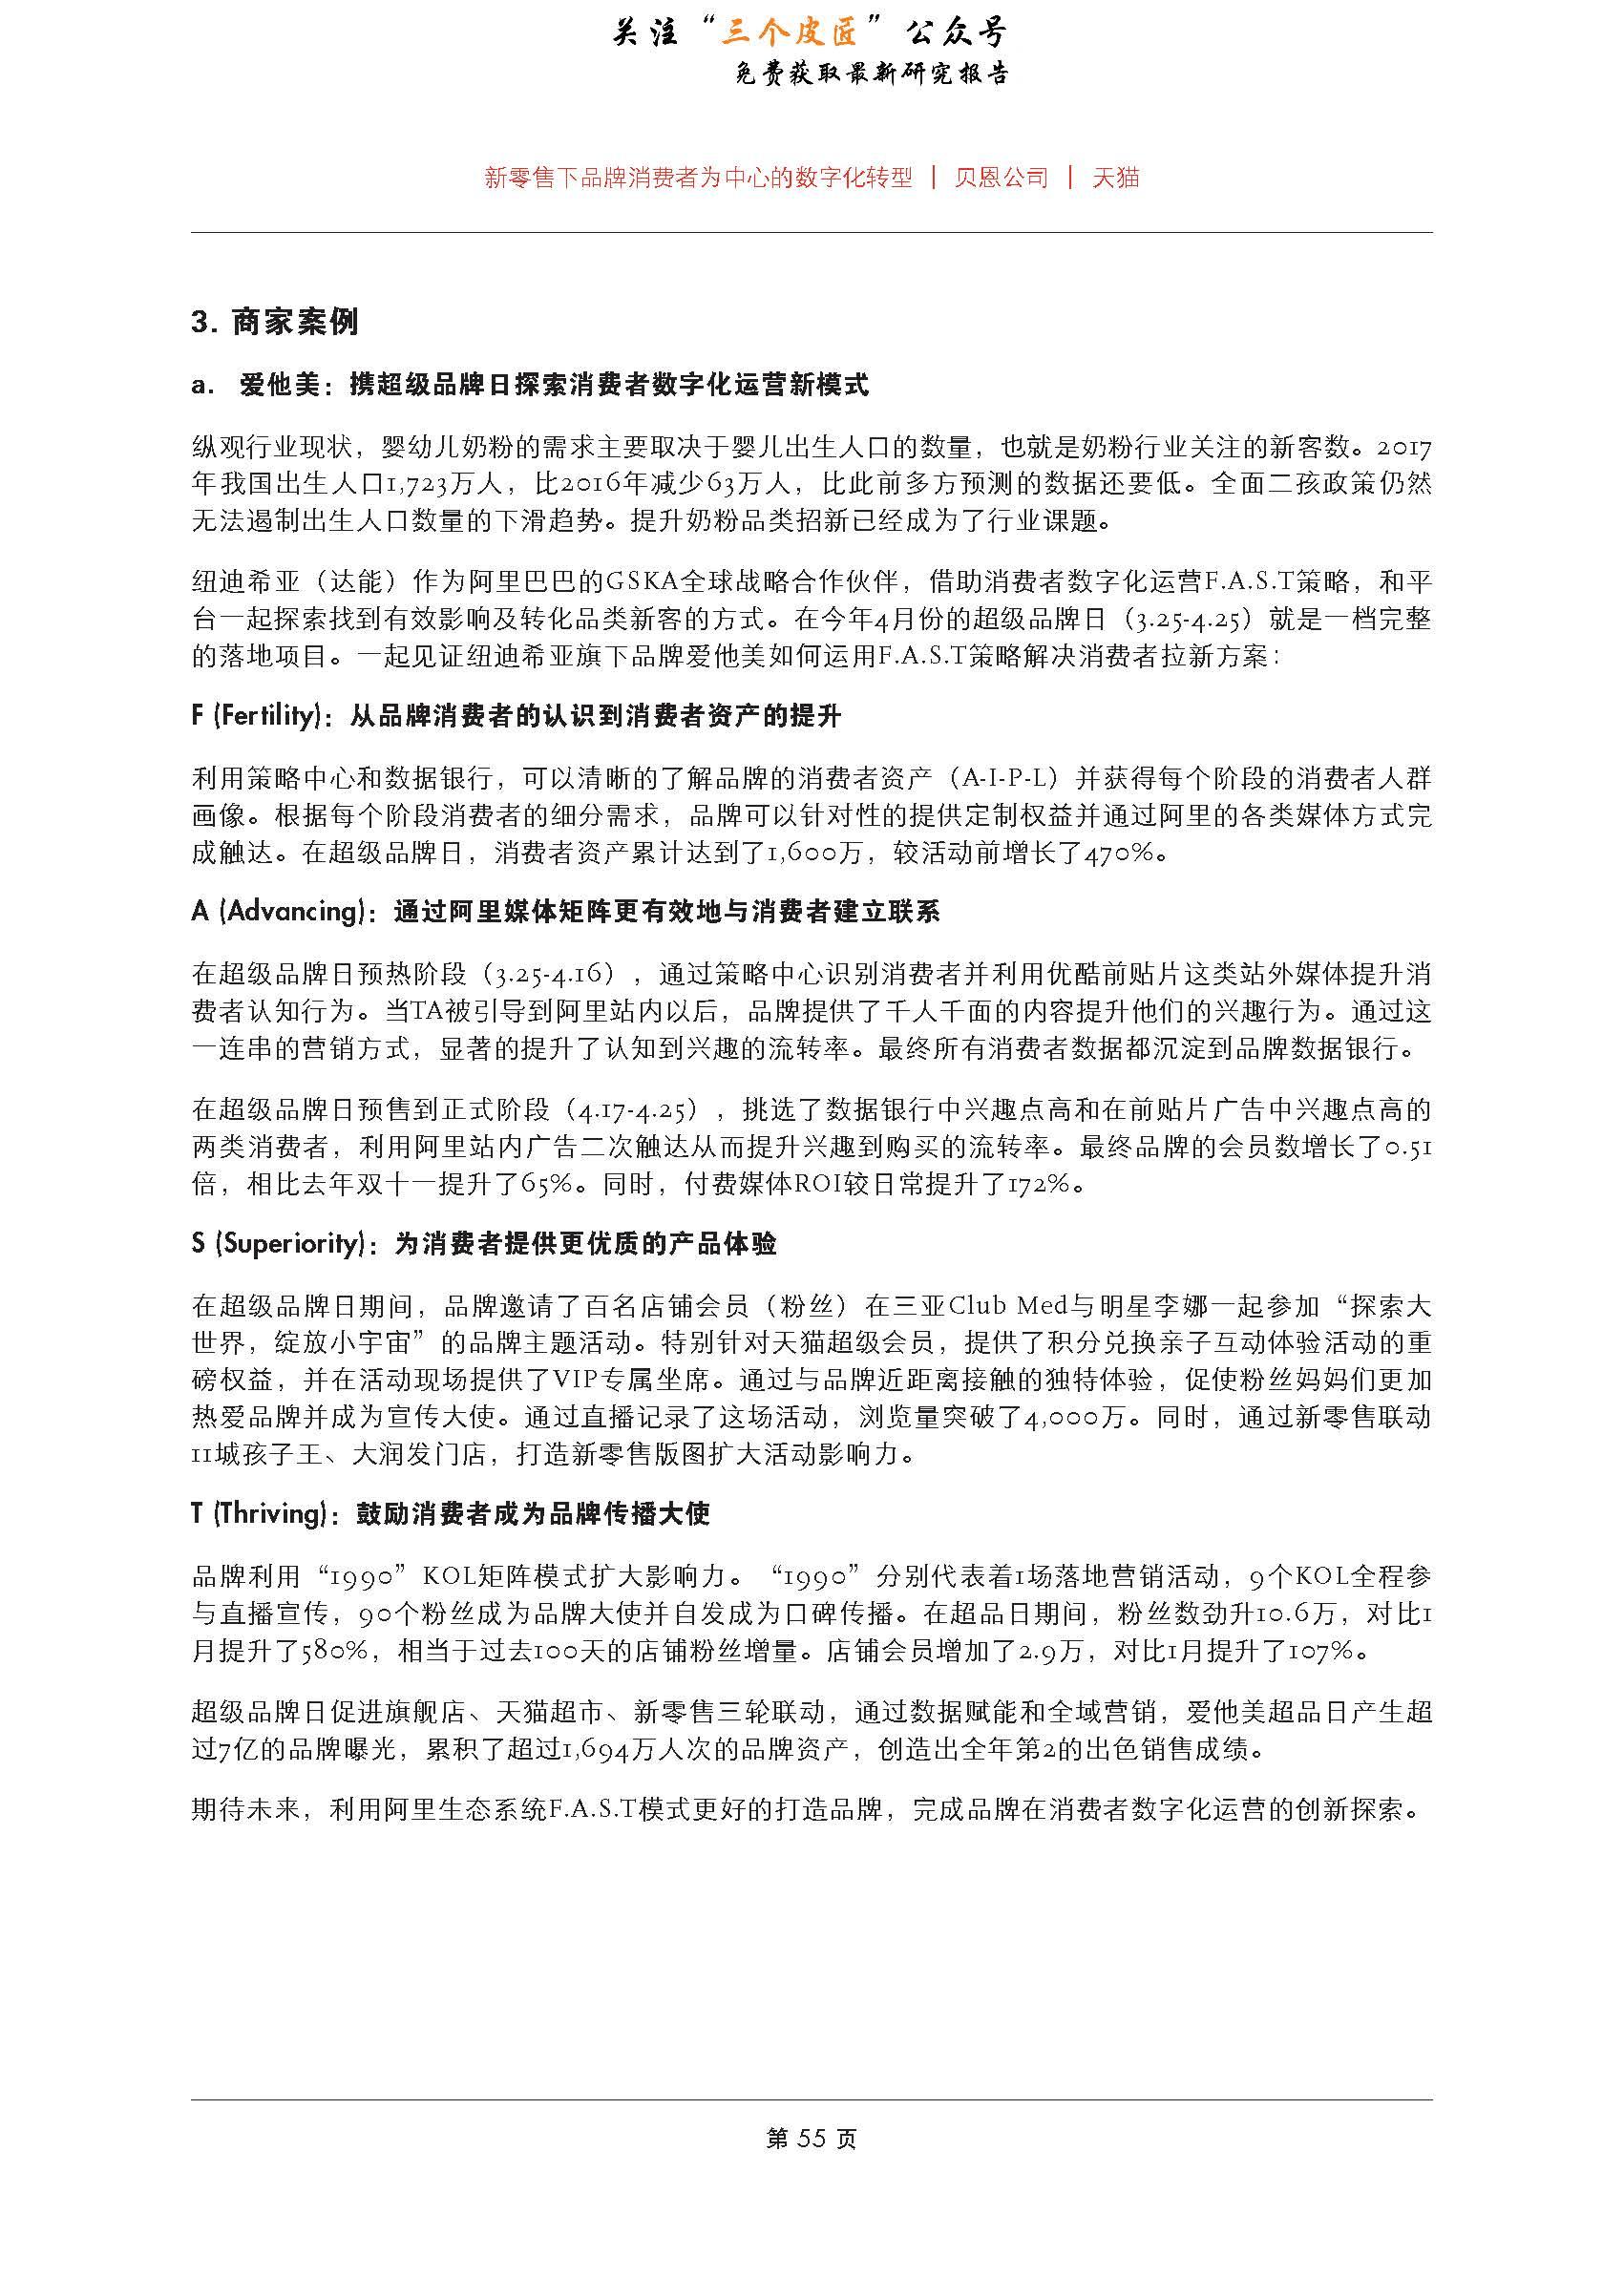 1_Page_57.jpg